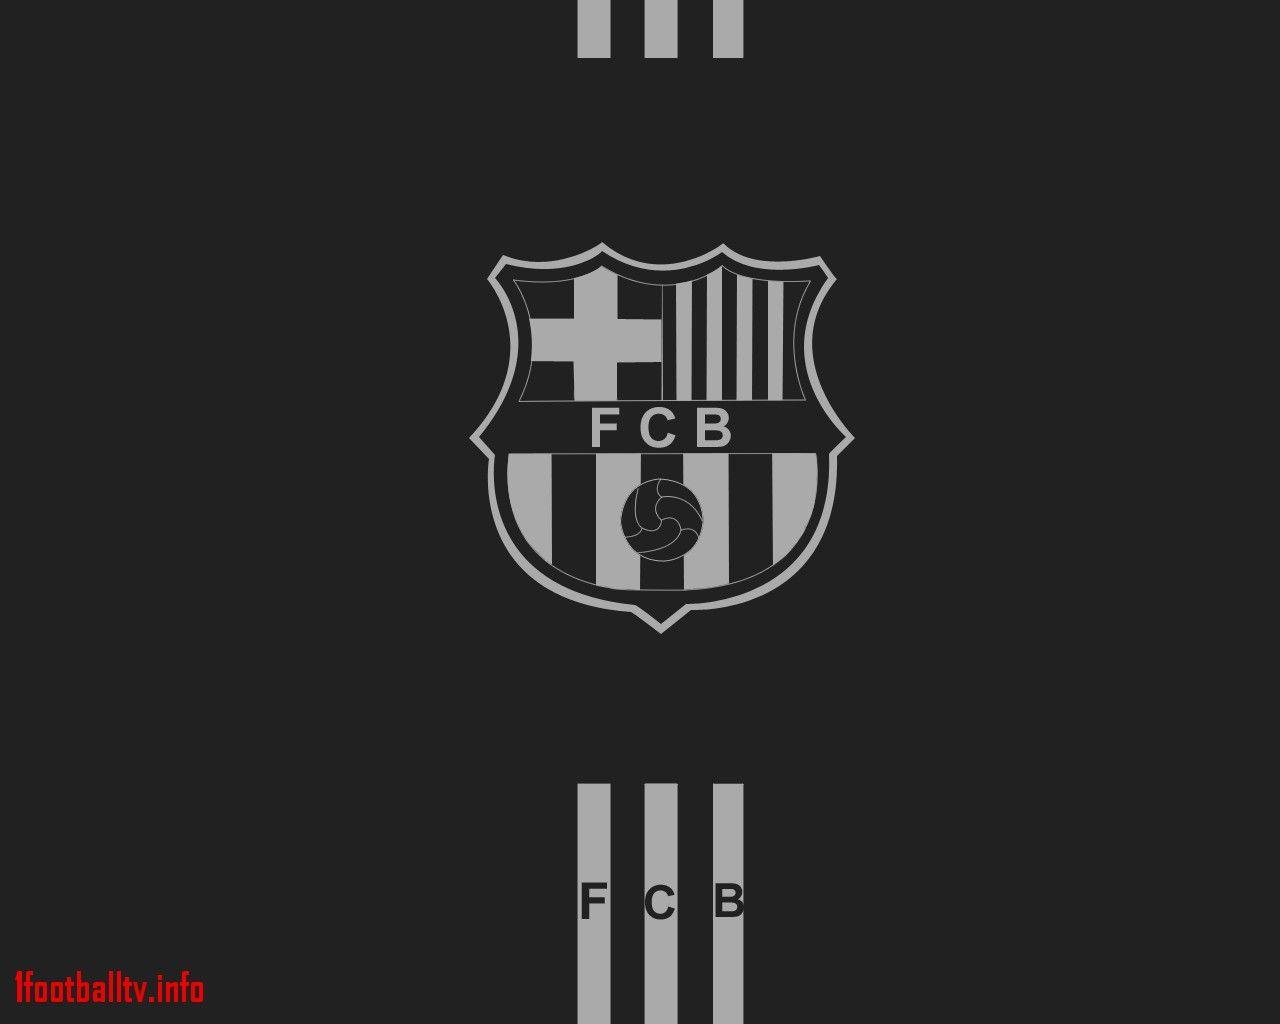 beautiful fc barcelona logo 1080p wallpaper barcelona black wallpaper hd 1280x1024 wallpaper teahub io beautiful fc barcelona logo 1080p